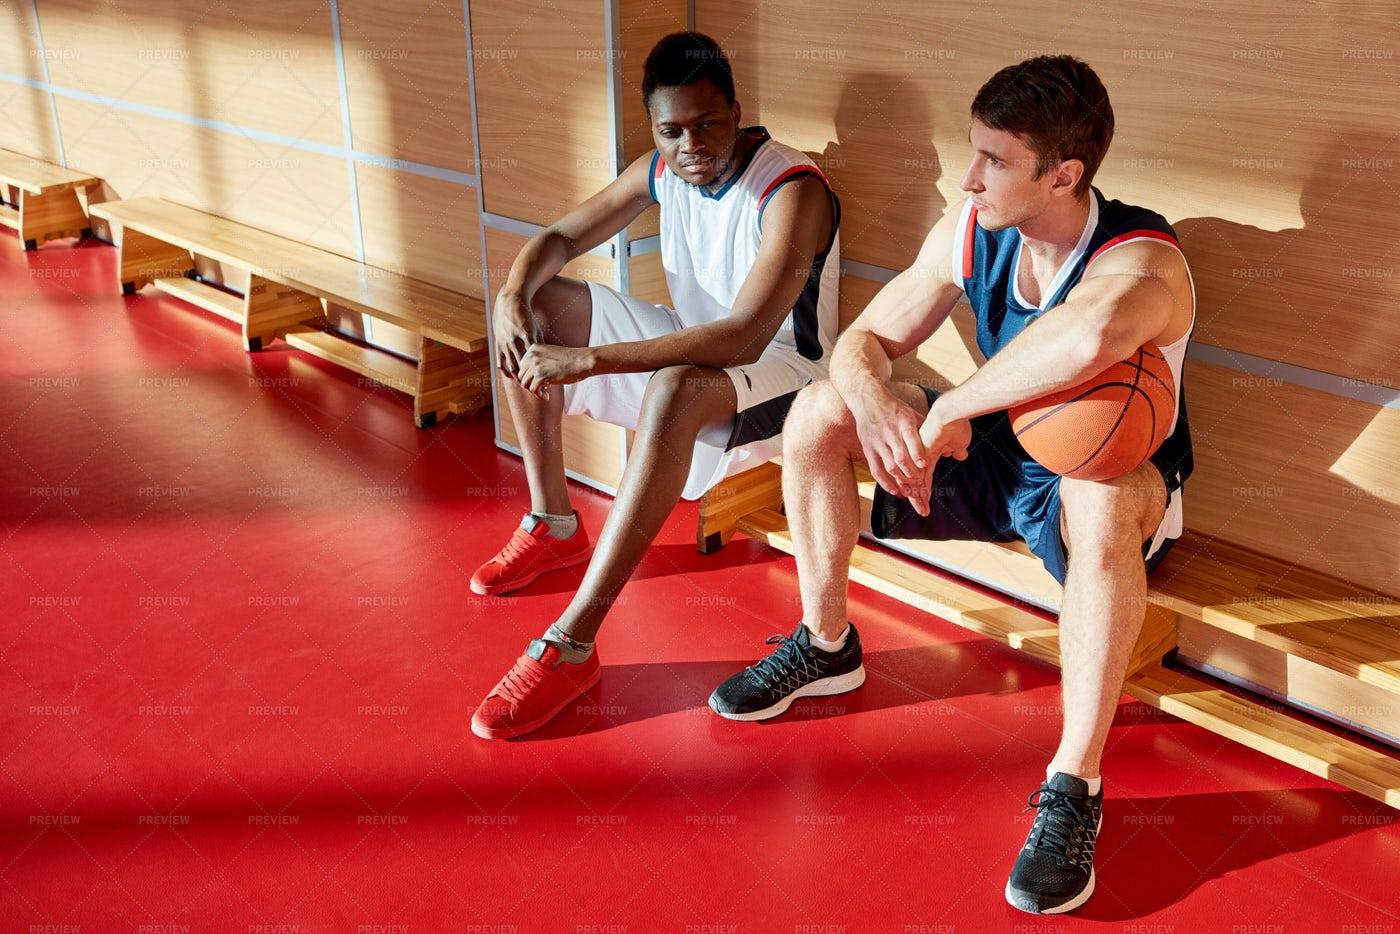 Sportsmen On Bench In Gym: Stock Photos